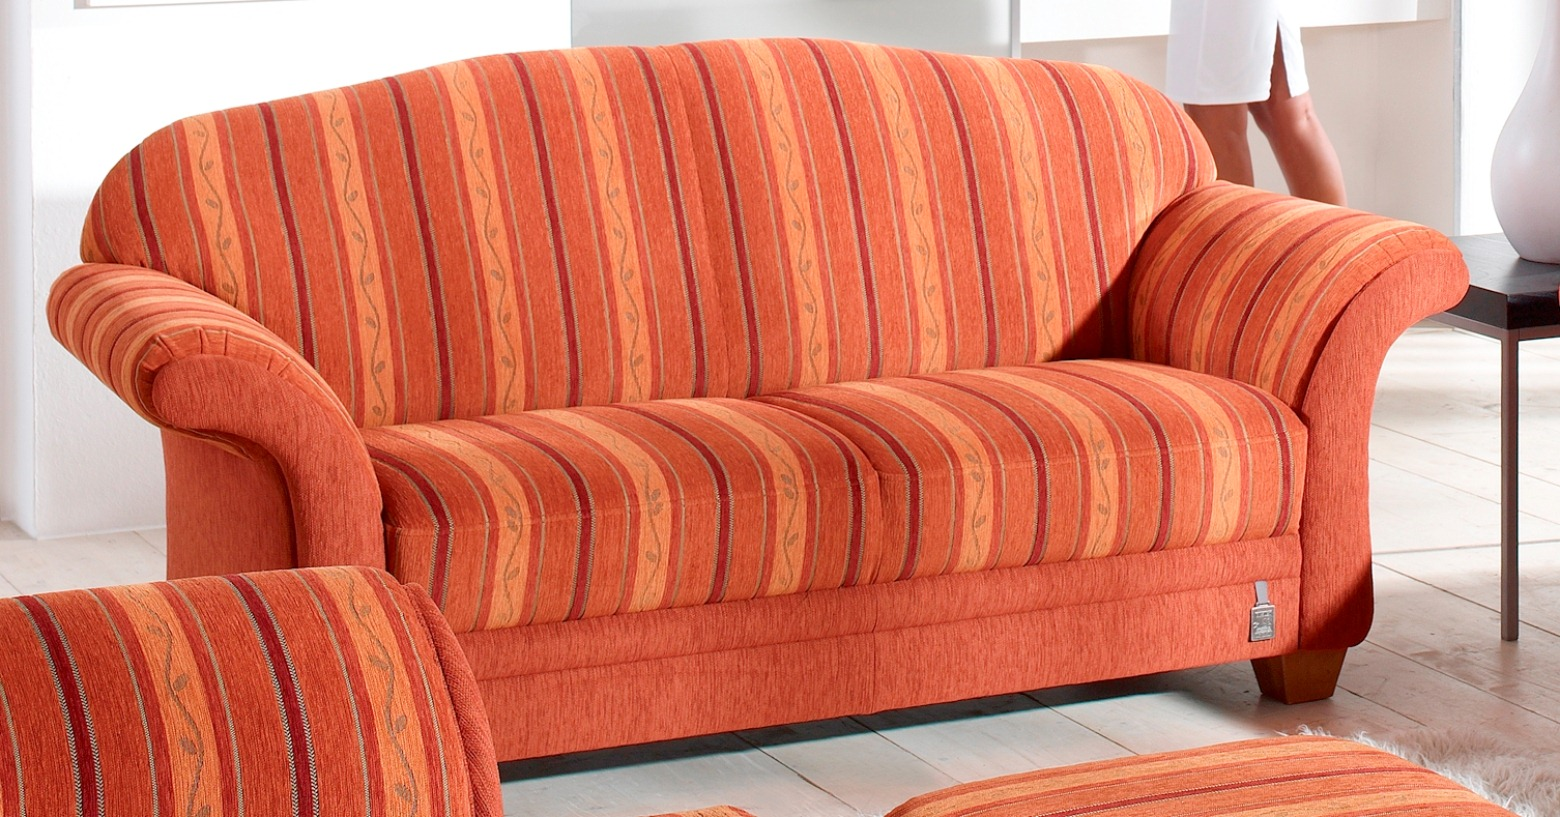 2 5 Sitzer Sofa Wallis